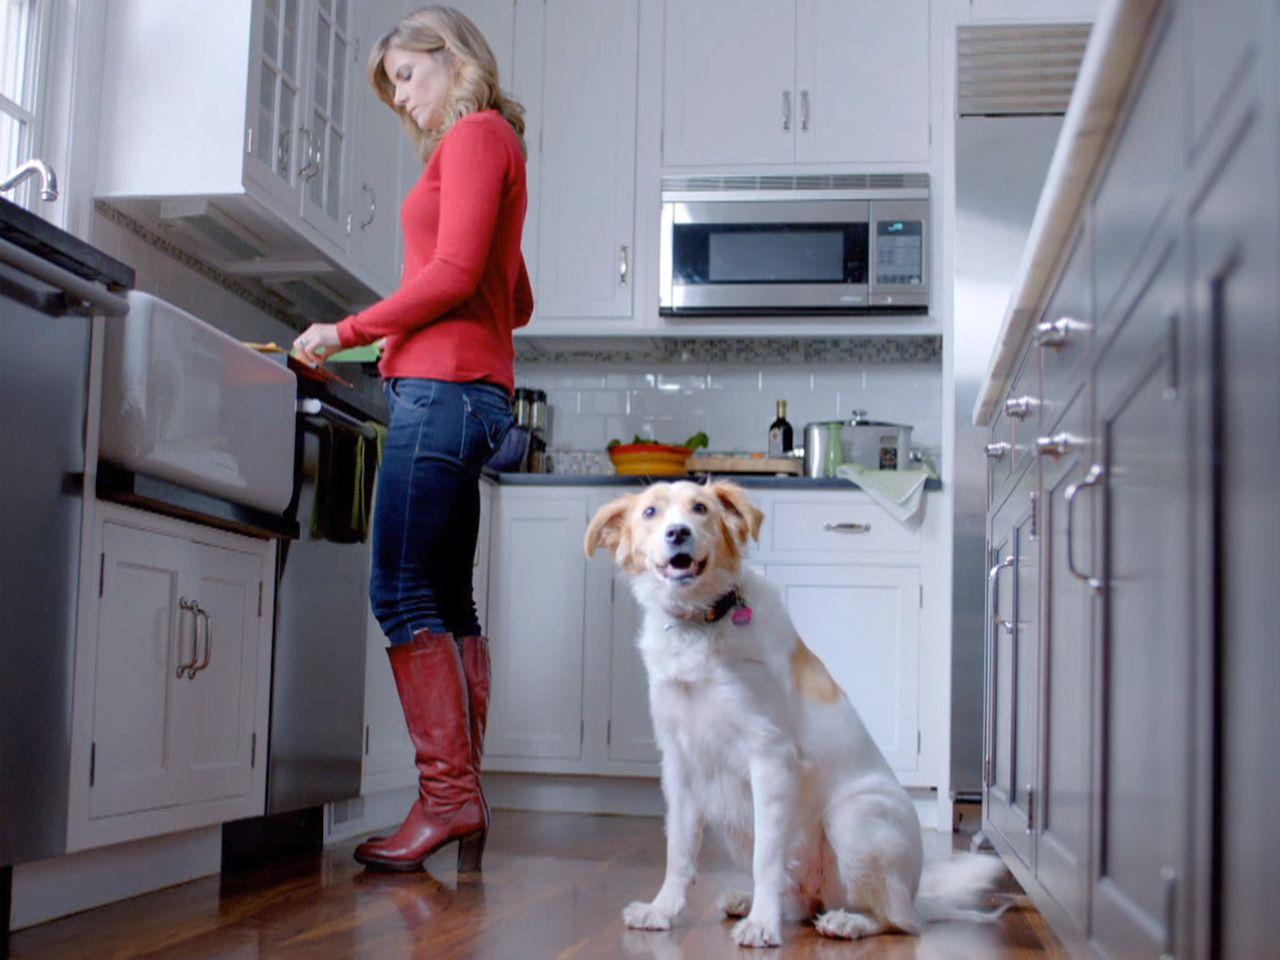 Natalie shares love for 'best friend' Zara in PSA Pet